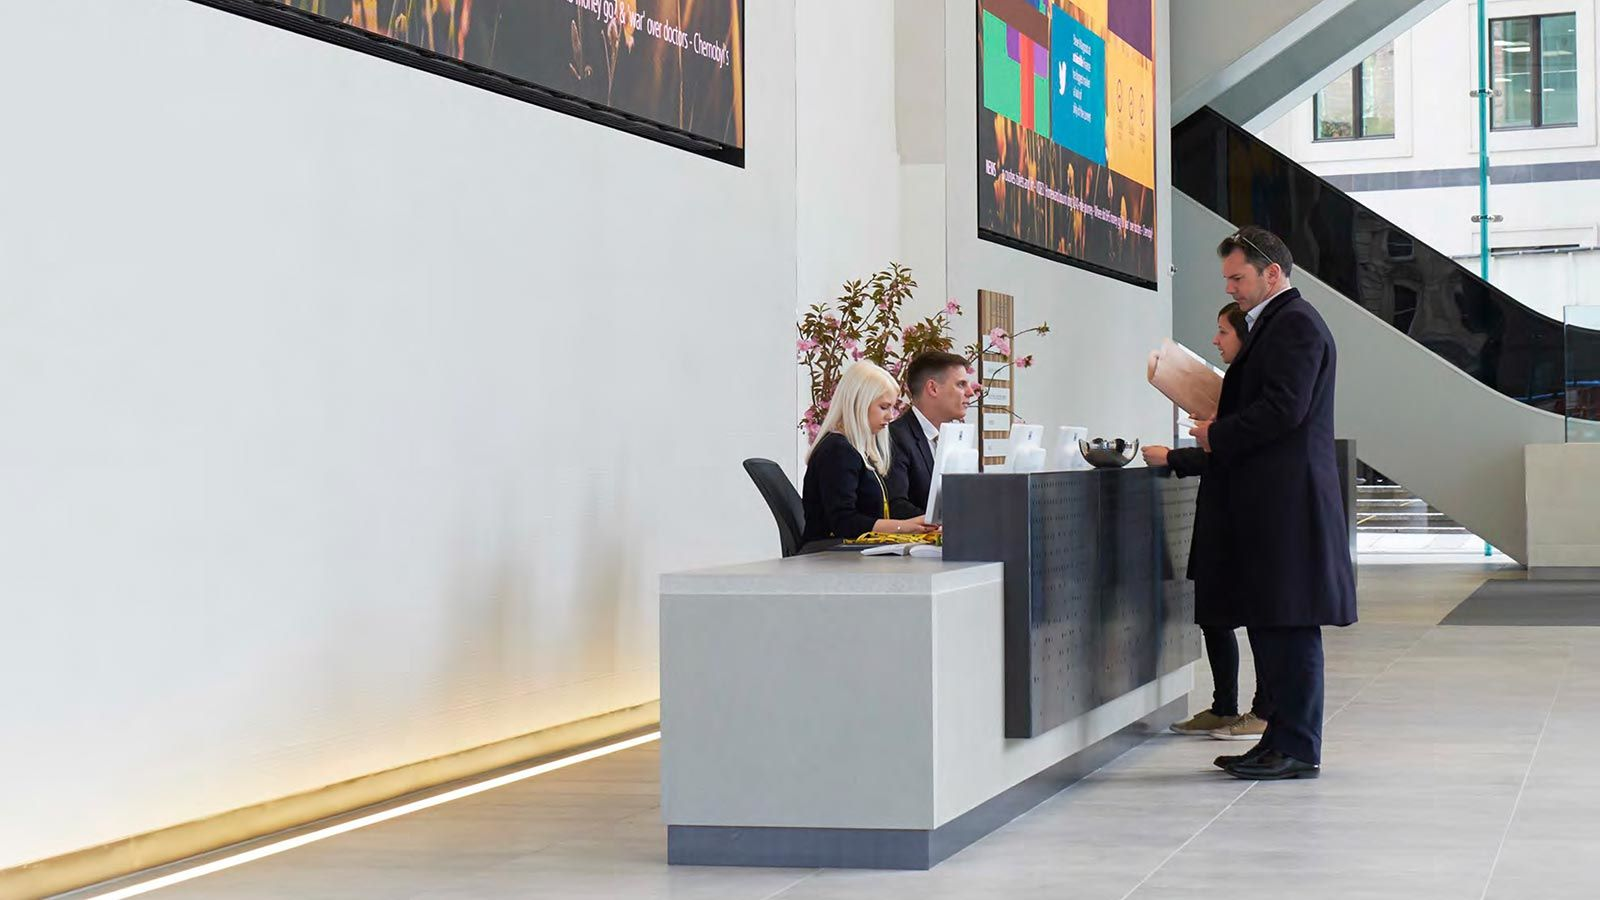 Aviva Building Reception Lobby - Mace Group